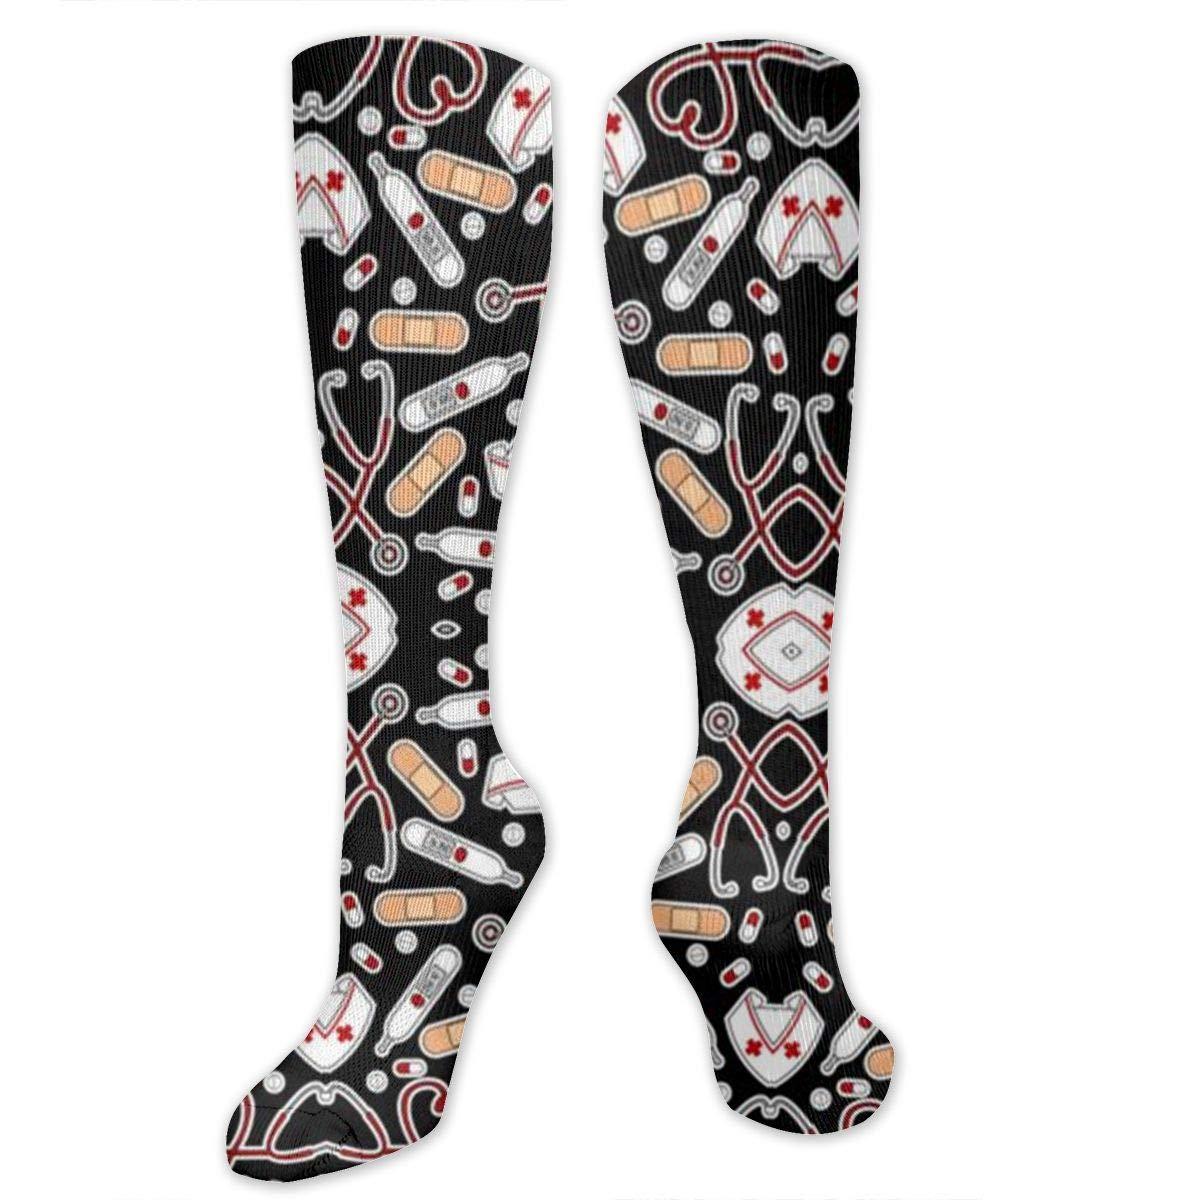 Men Multicolored Pattern Fashionable Fun Crew Cotton Socks Chanwazibibiliu Cute Nurse Love Black Mens Colorful Dress Socks Funky